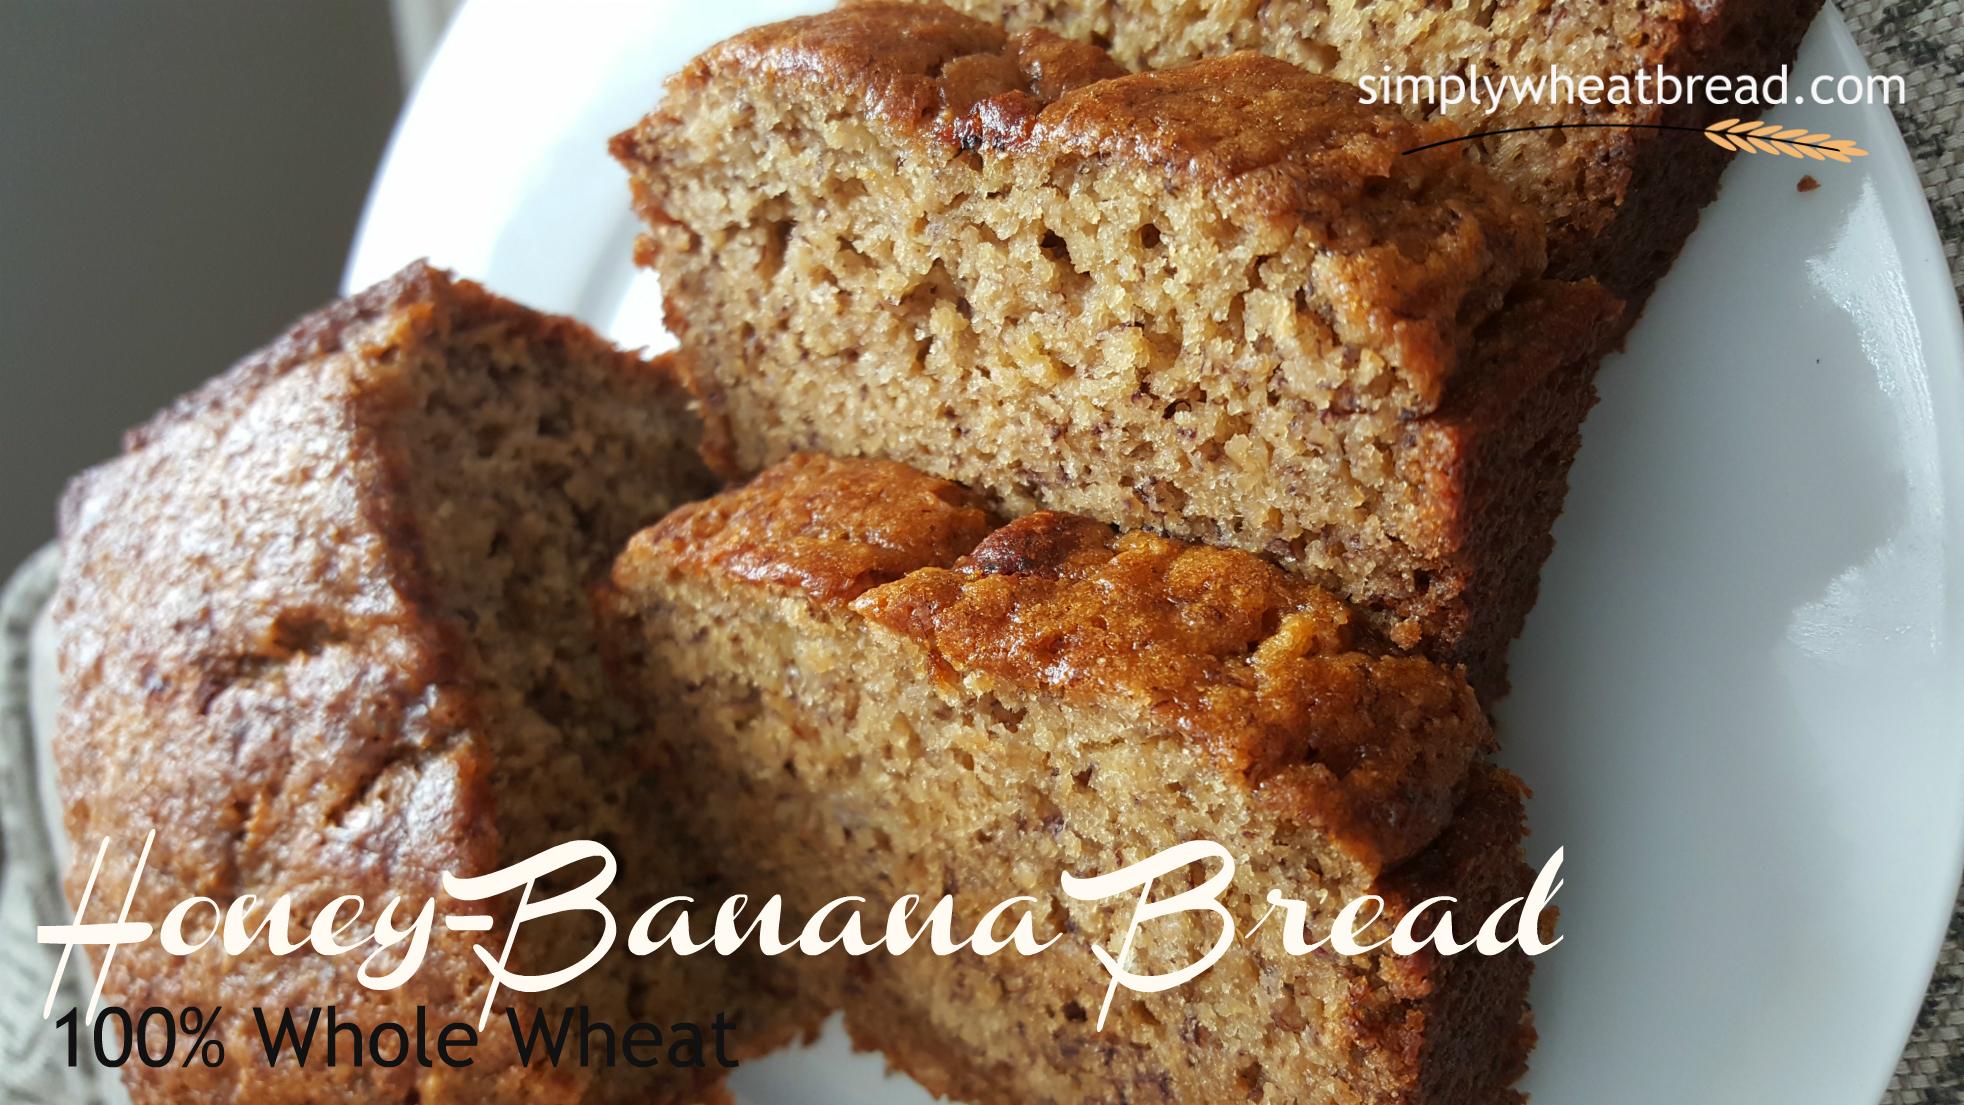 Best Tasting 100% Whole Wheat Honey-Banana Bread – So Delicious!